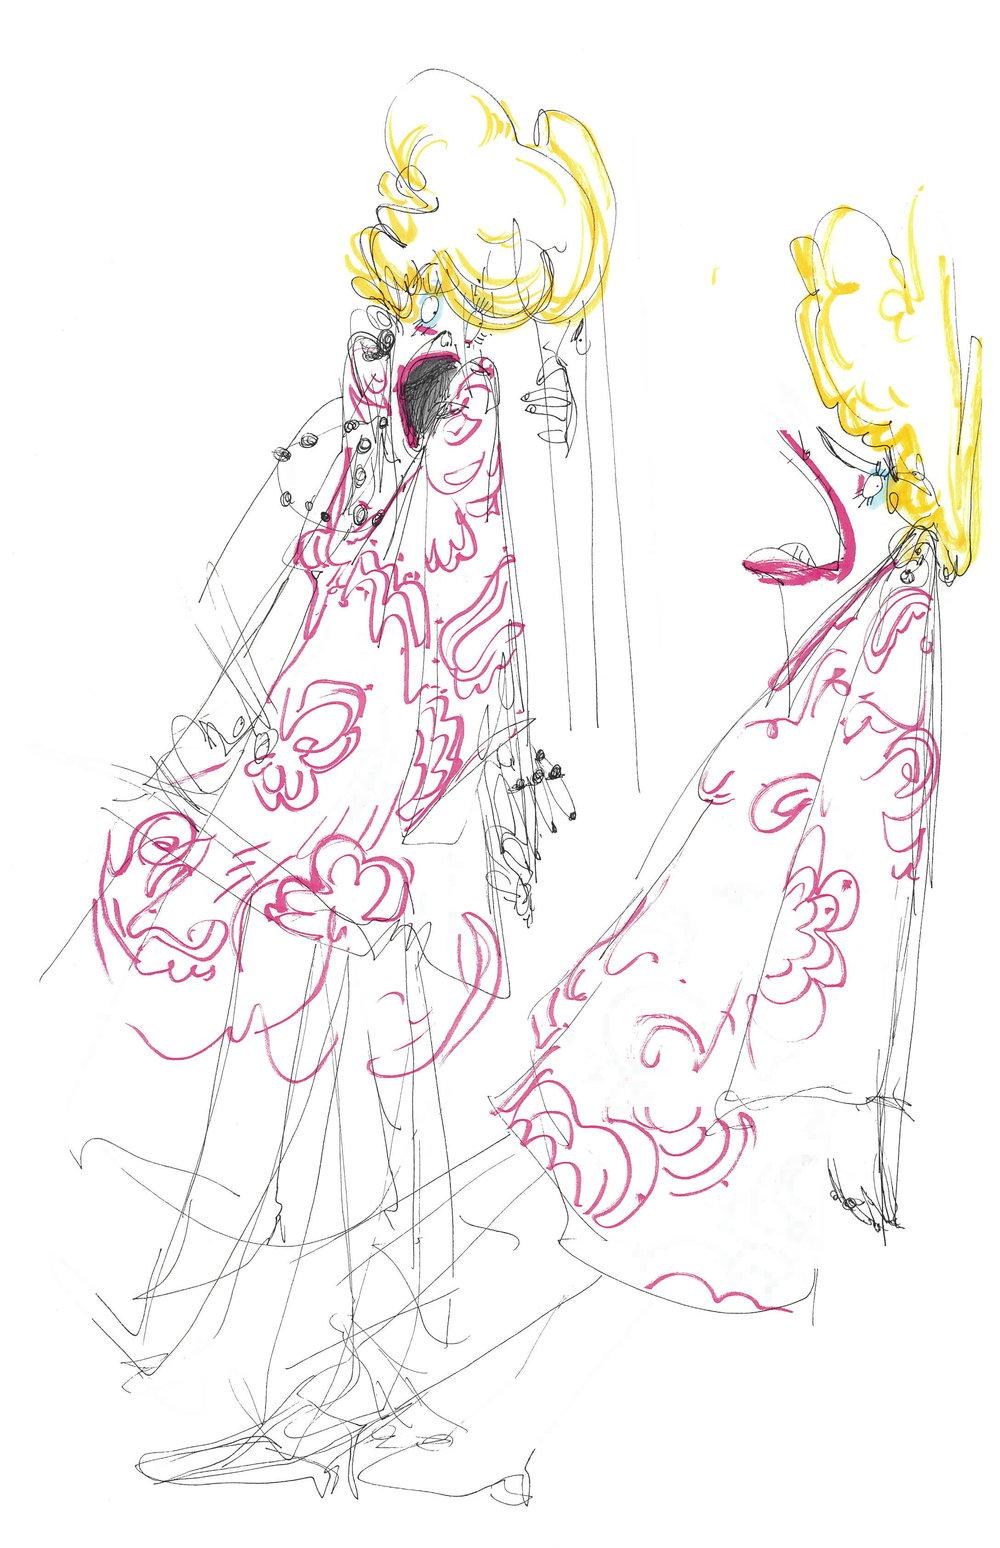 BRIANWONDERS-sketches-1_Page_11_Image_0001.jpg